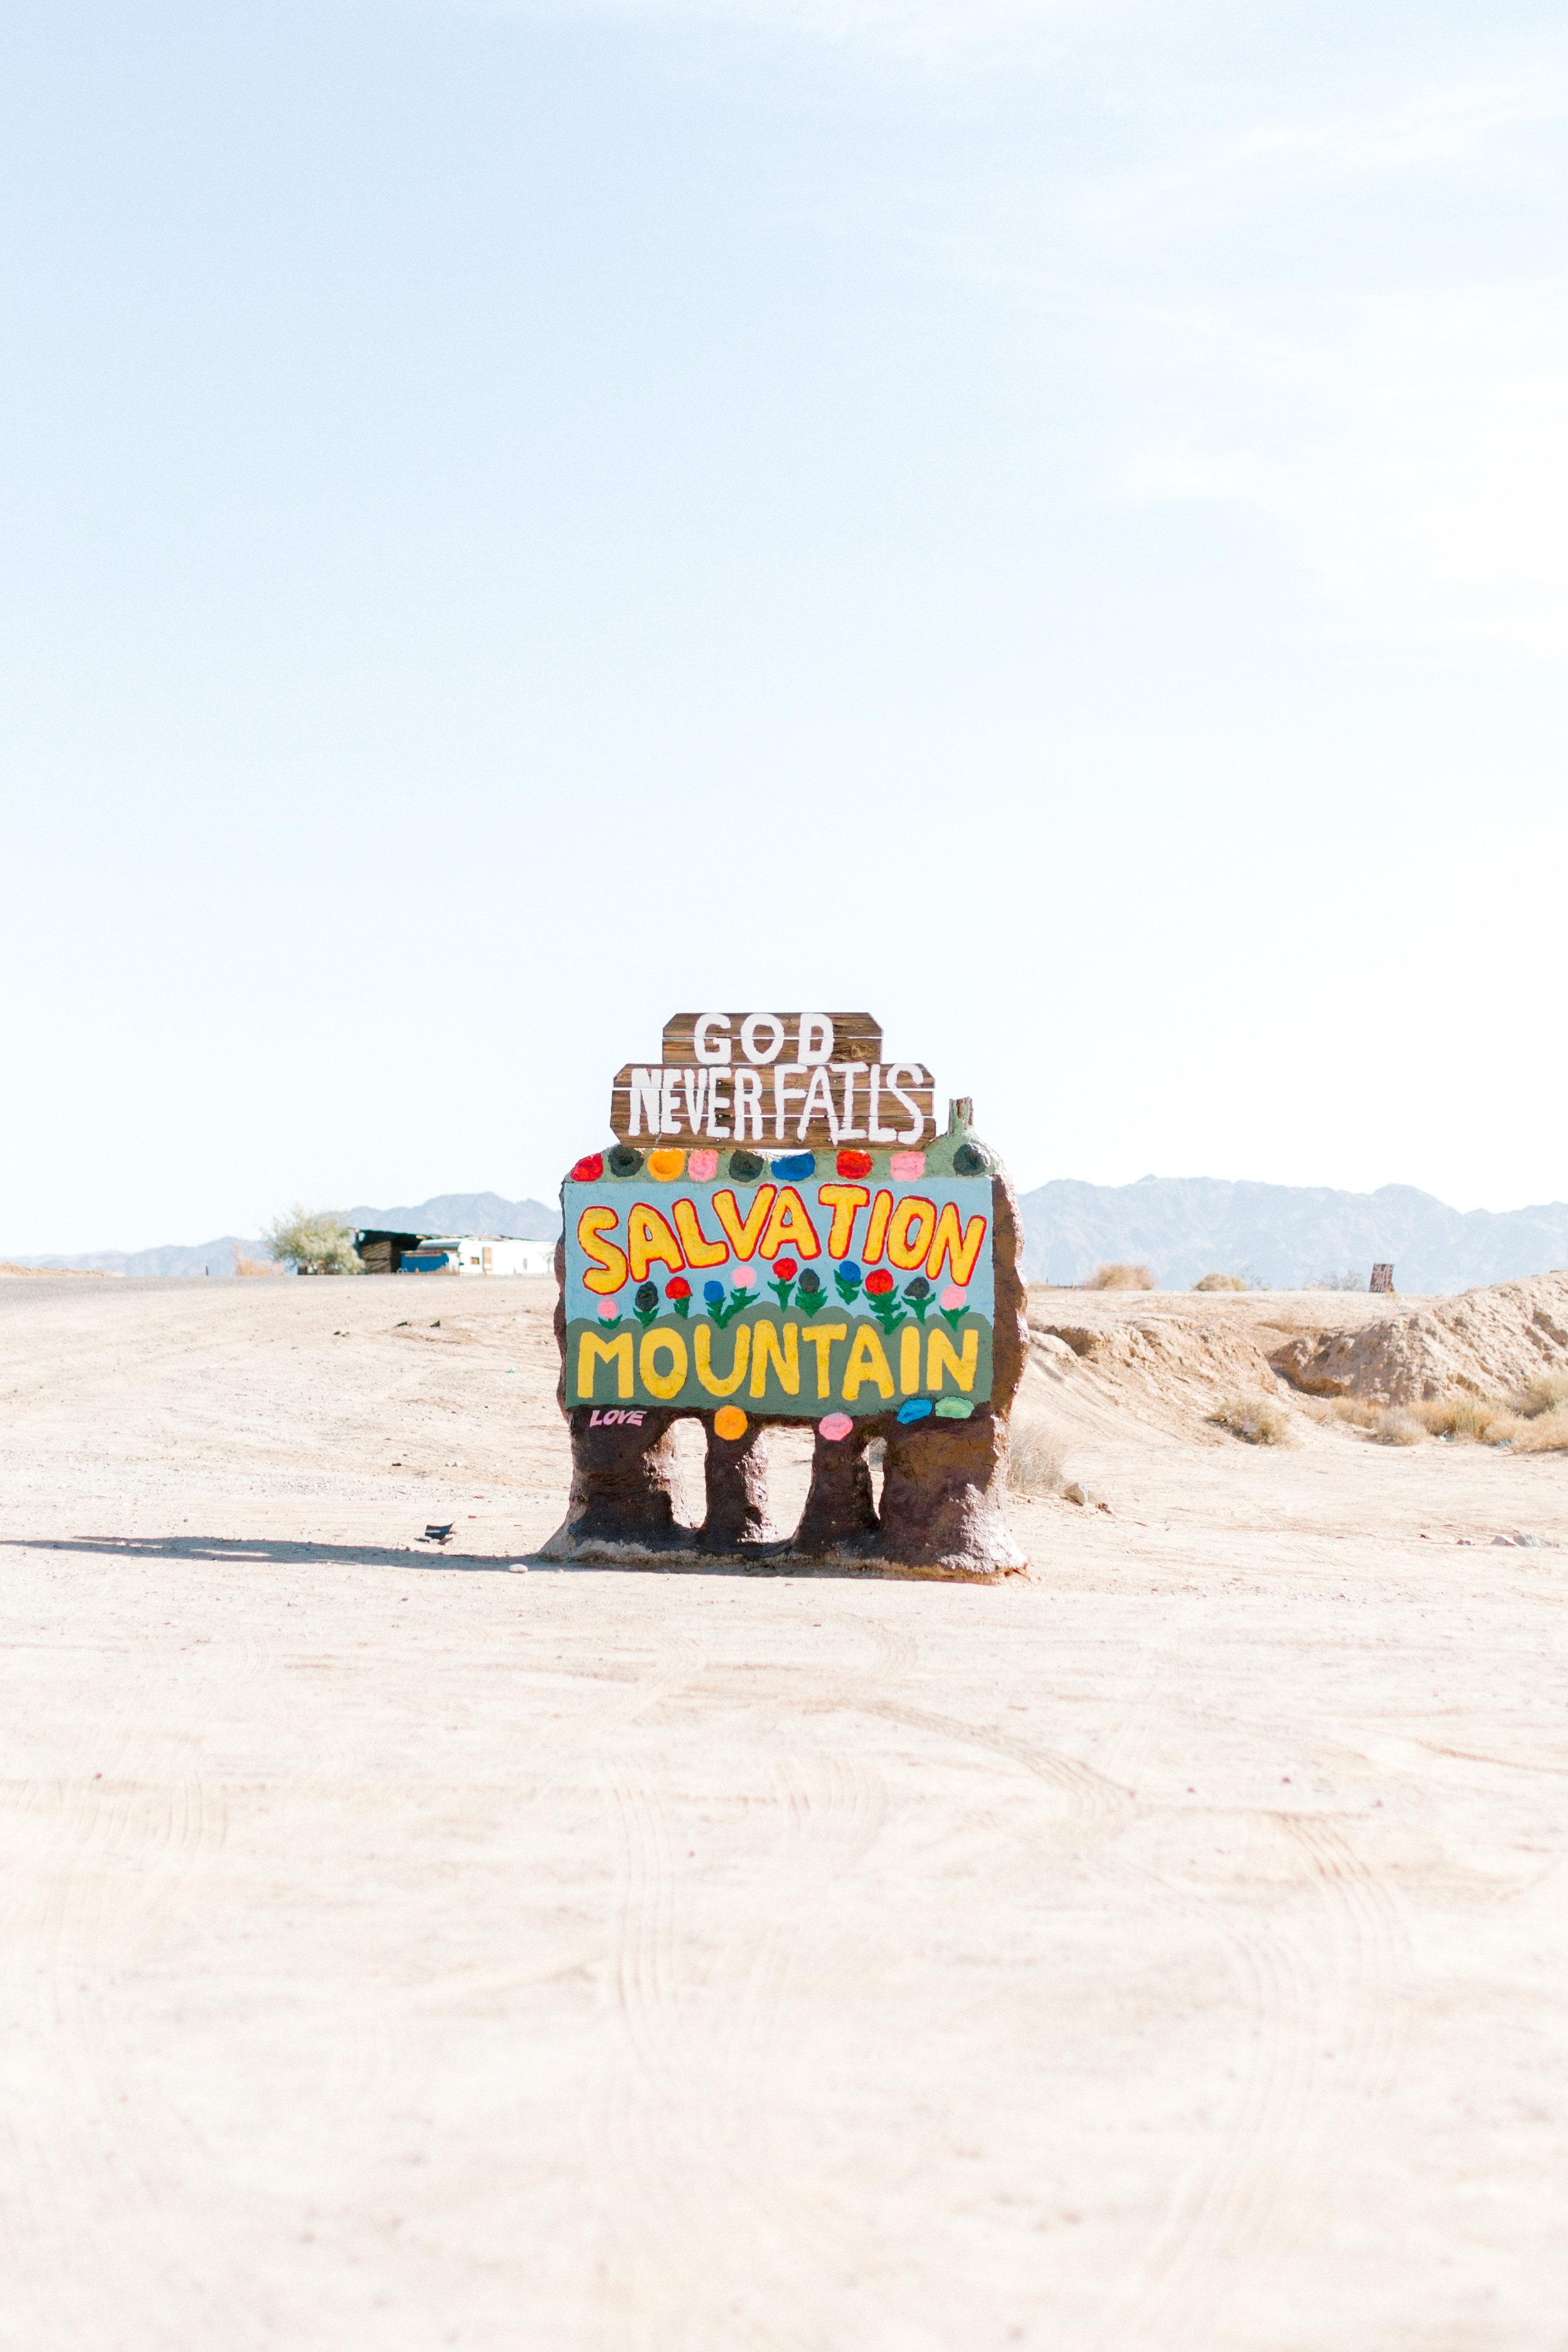 Jessica Sgubin Photography Atlanta Portrait photographer los angeles la salvation mountain greenhouse cactus garden moorten botanical garden cabazon dinosaurs santa monica joshua tree-1-5.jpg